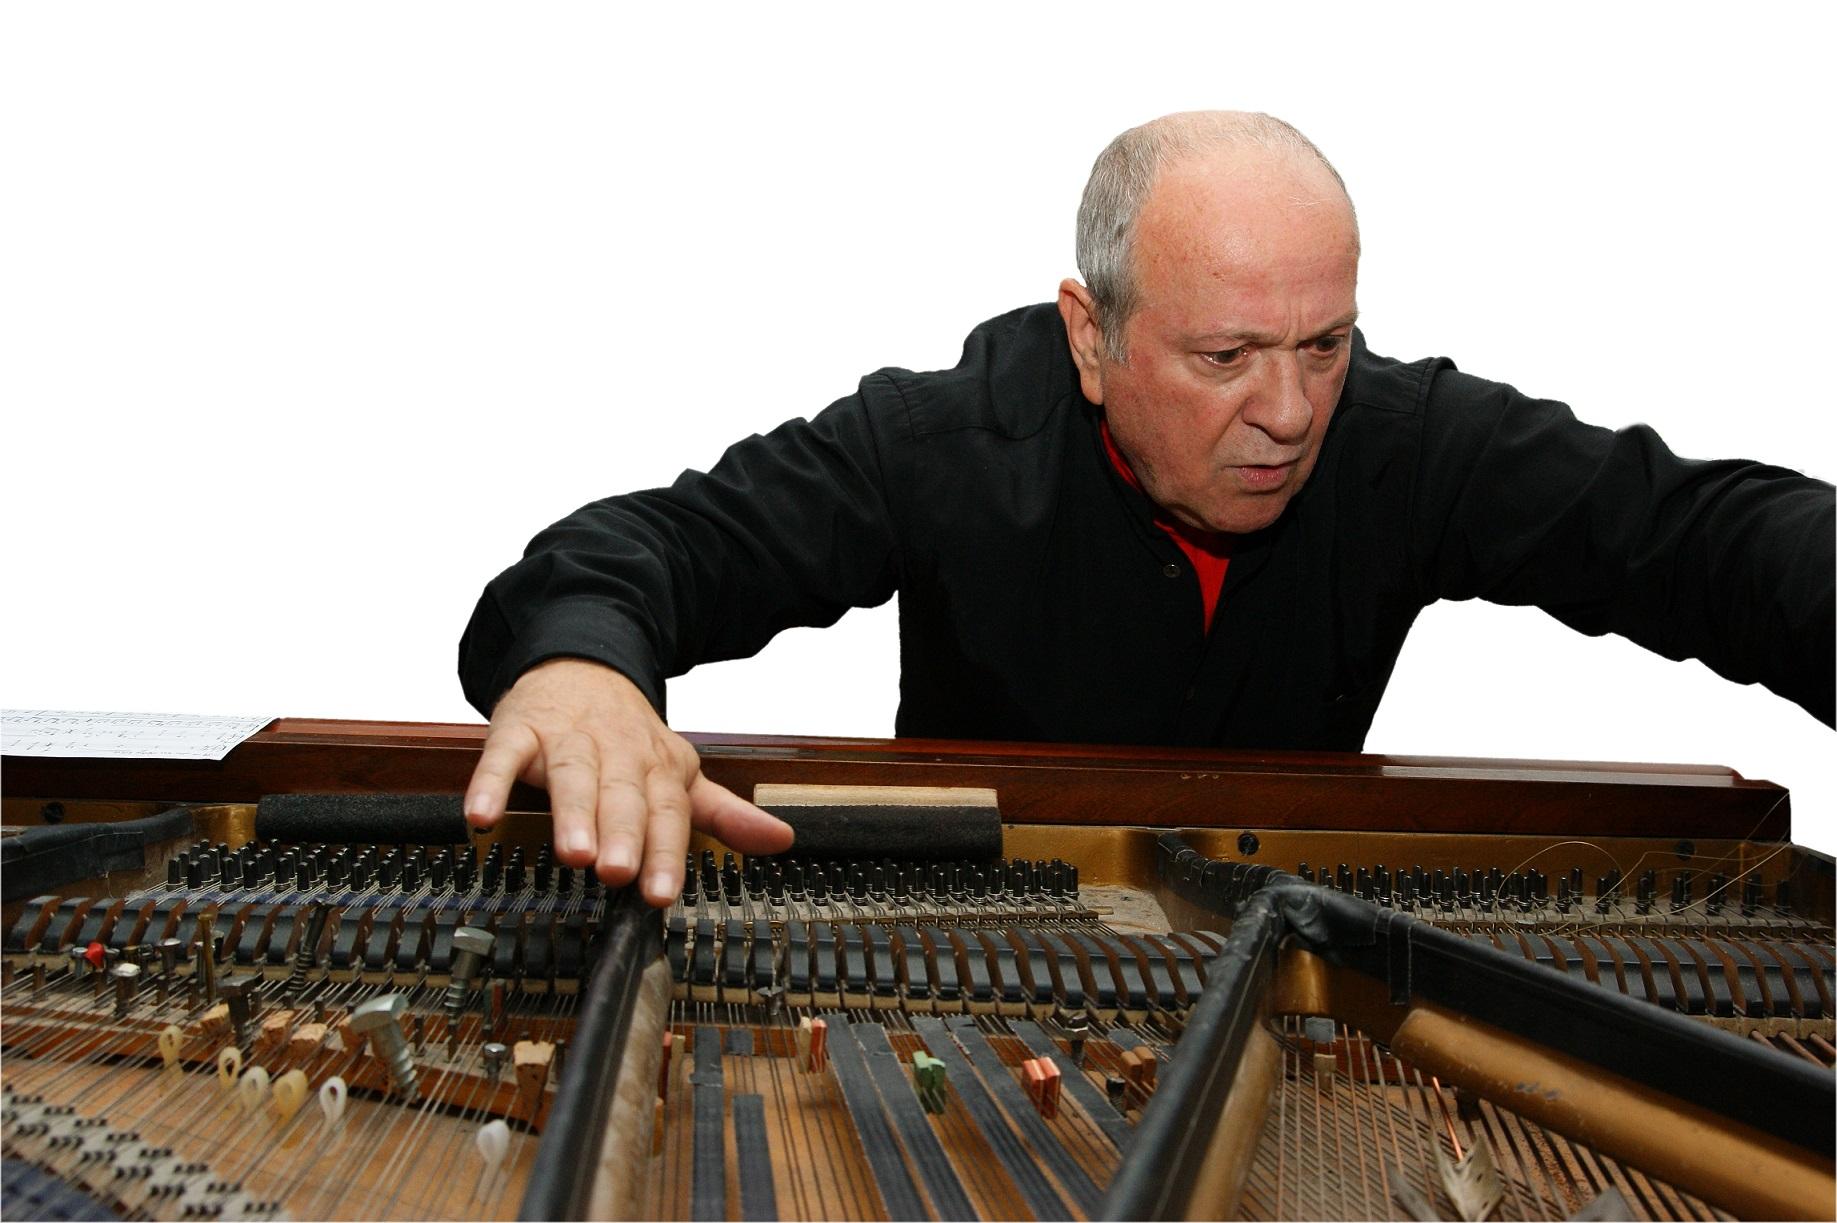 Hans-Karsten Raecke Musikbrennerei Rheinsberg